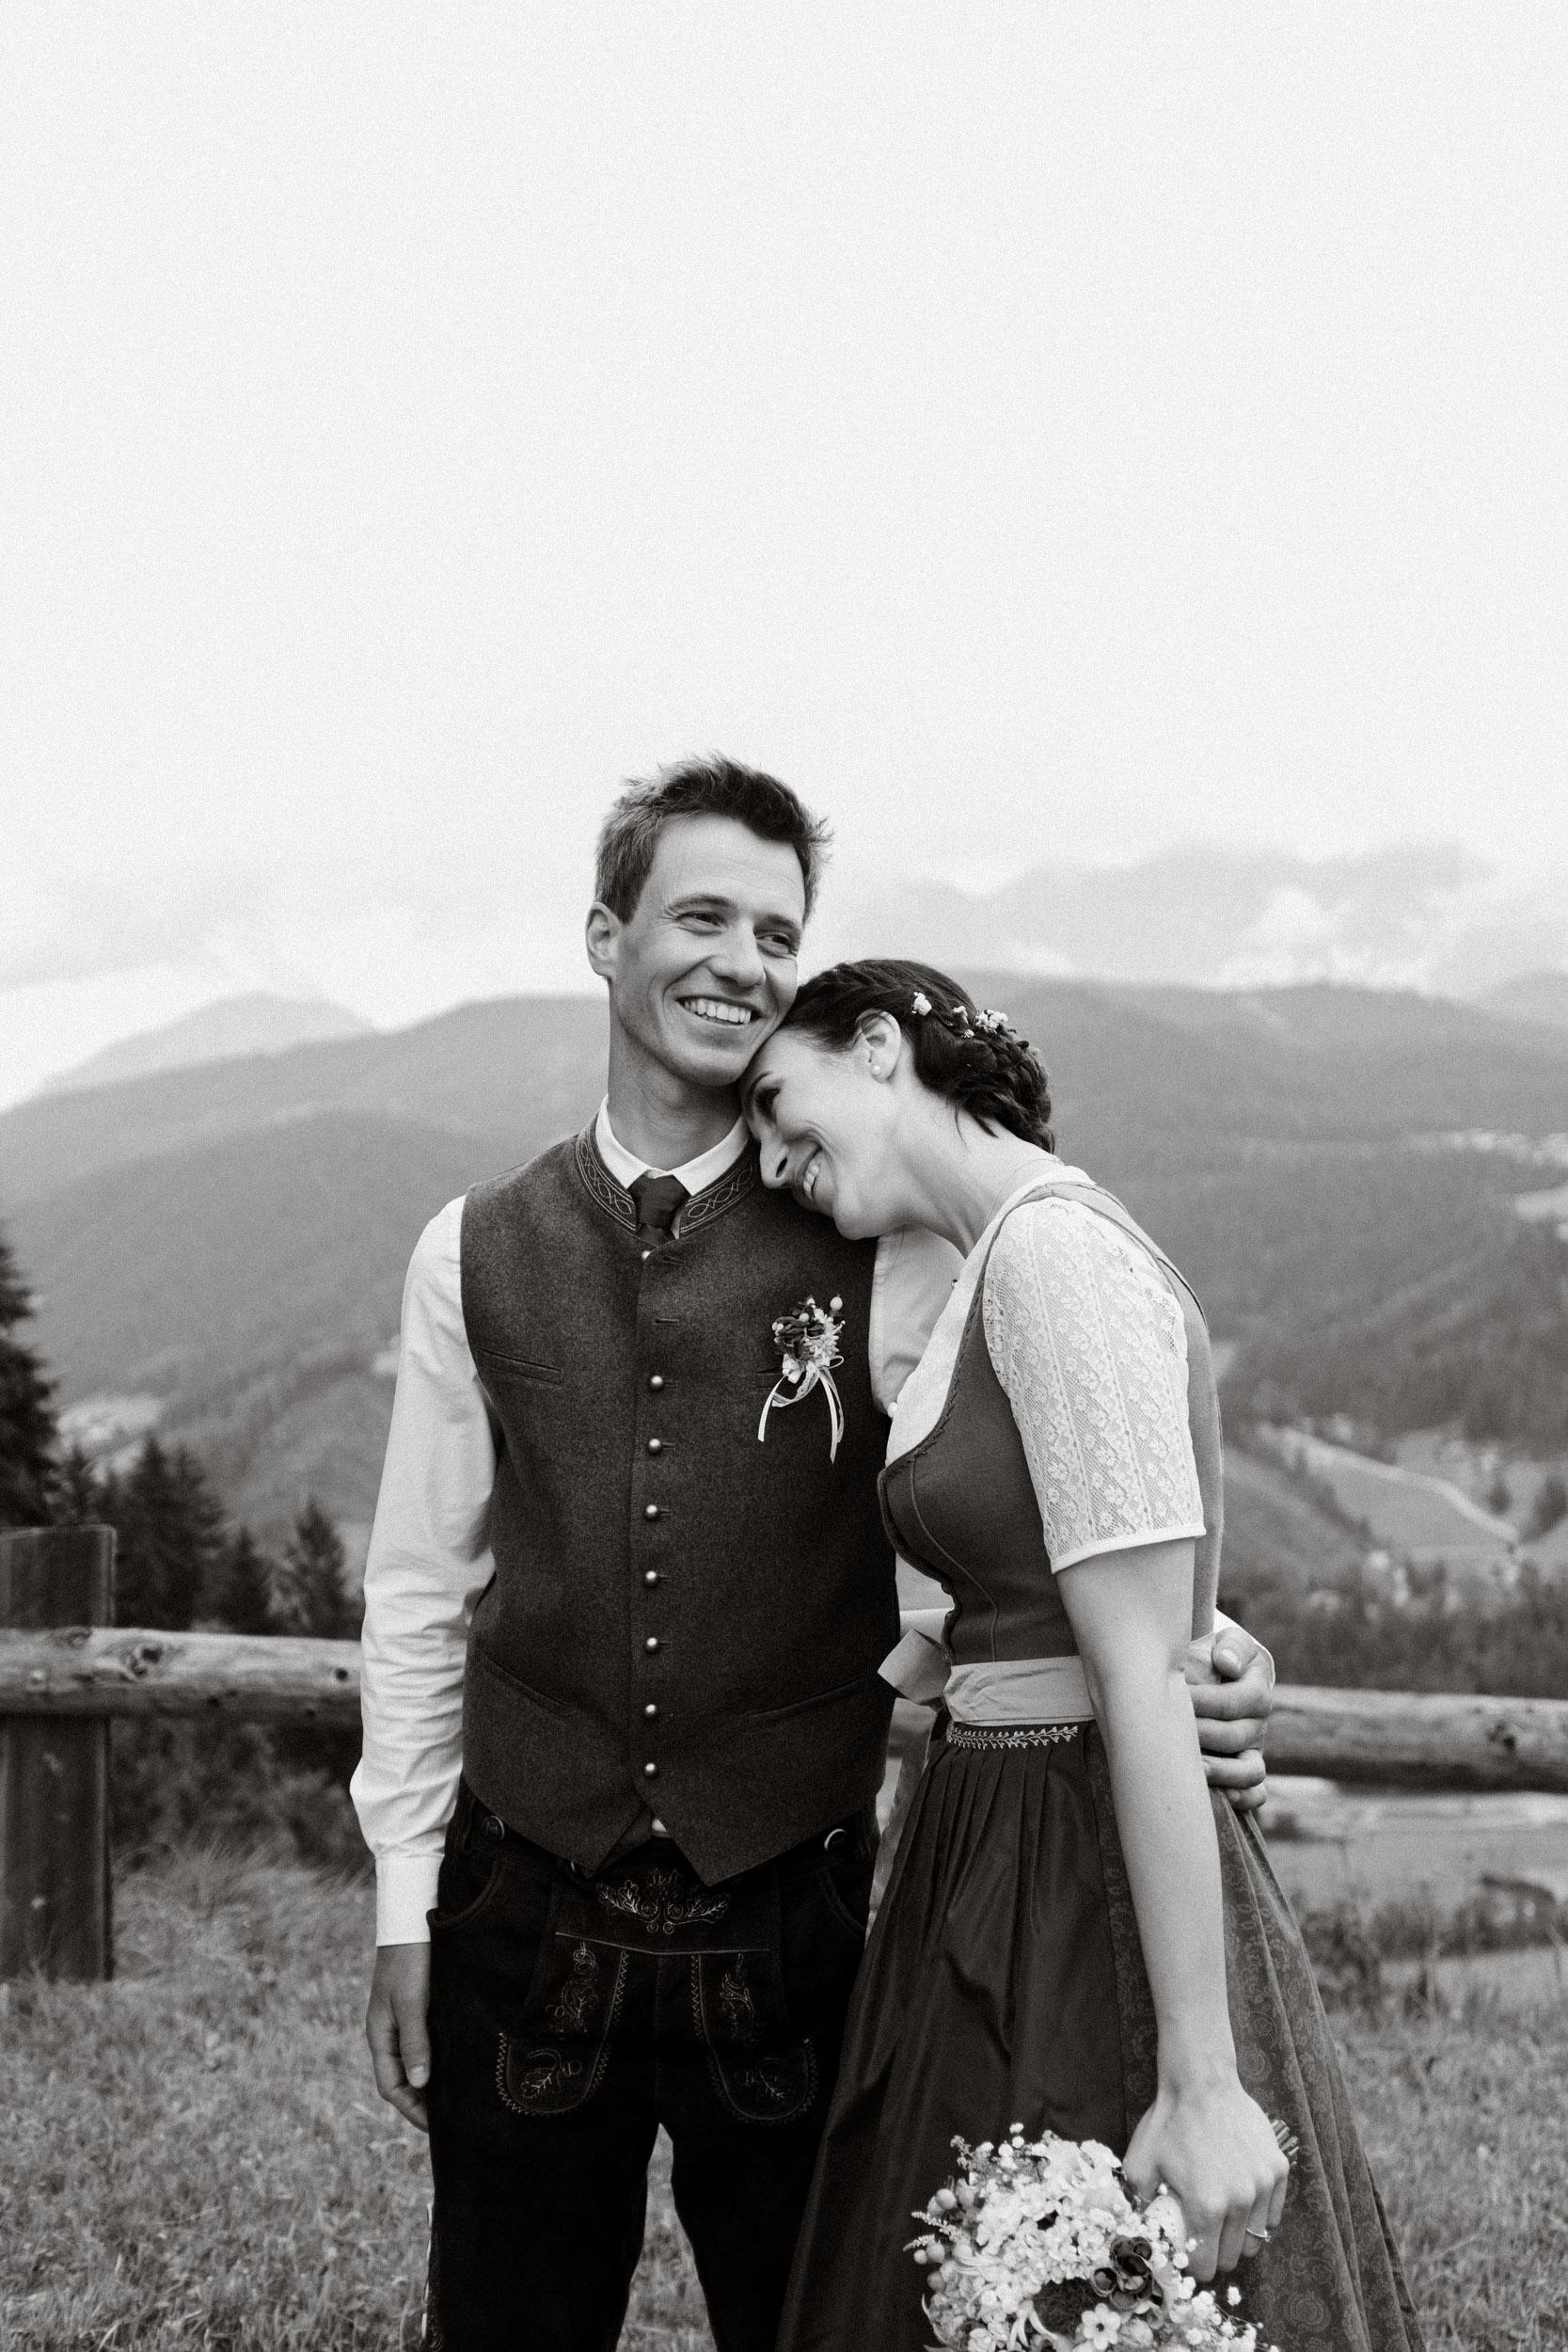 austria_mountain_wedding_photography_countryside_vienna-15.jpg